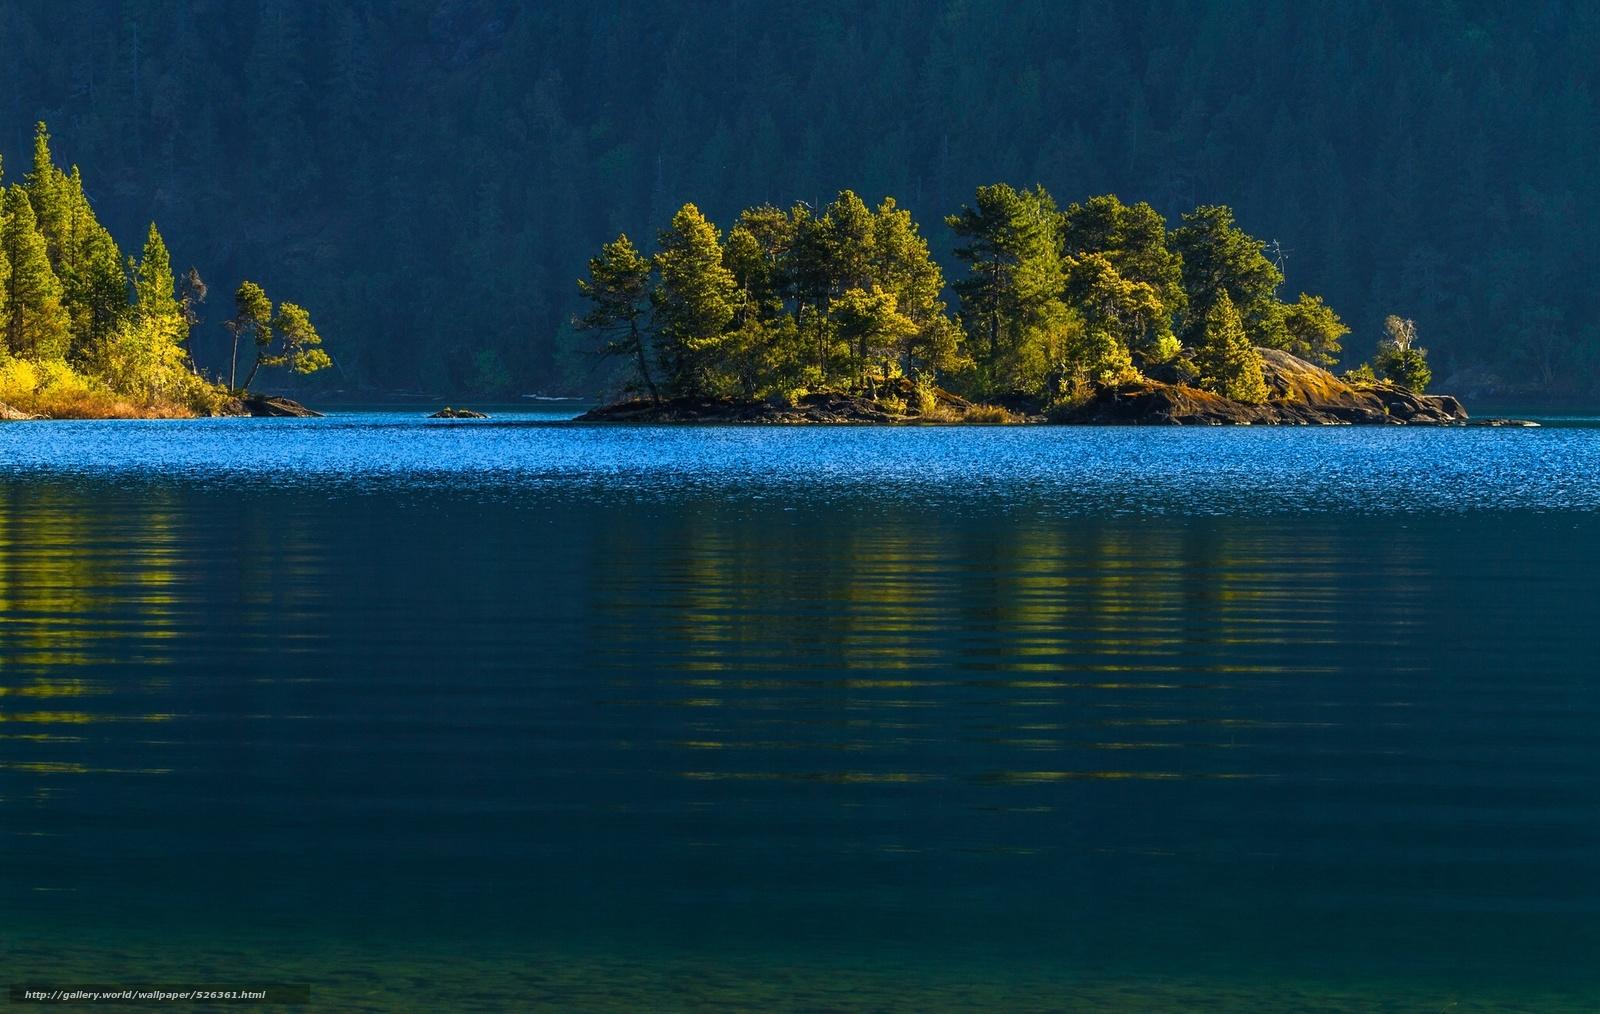 Download Wallpaper Cowichan Lake, Vancouver Island, Canada